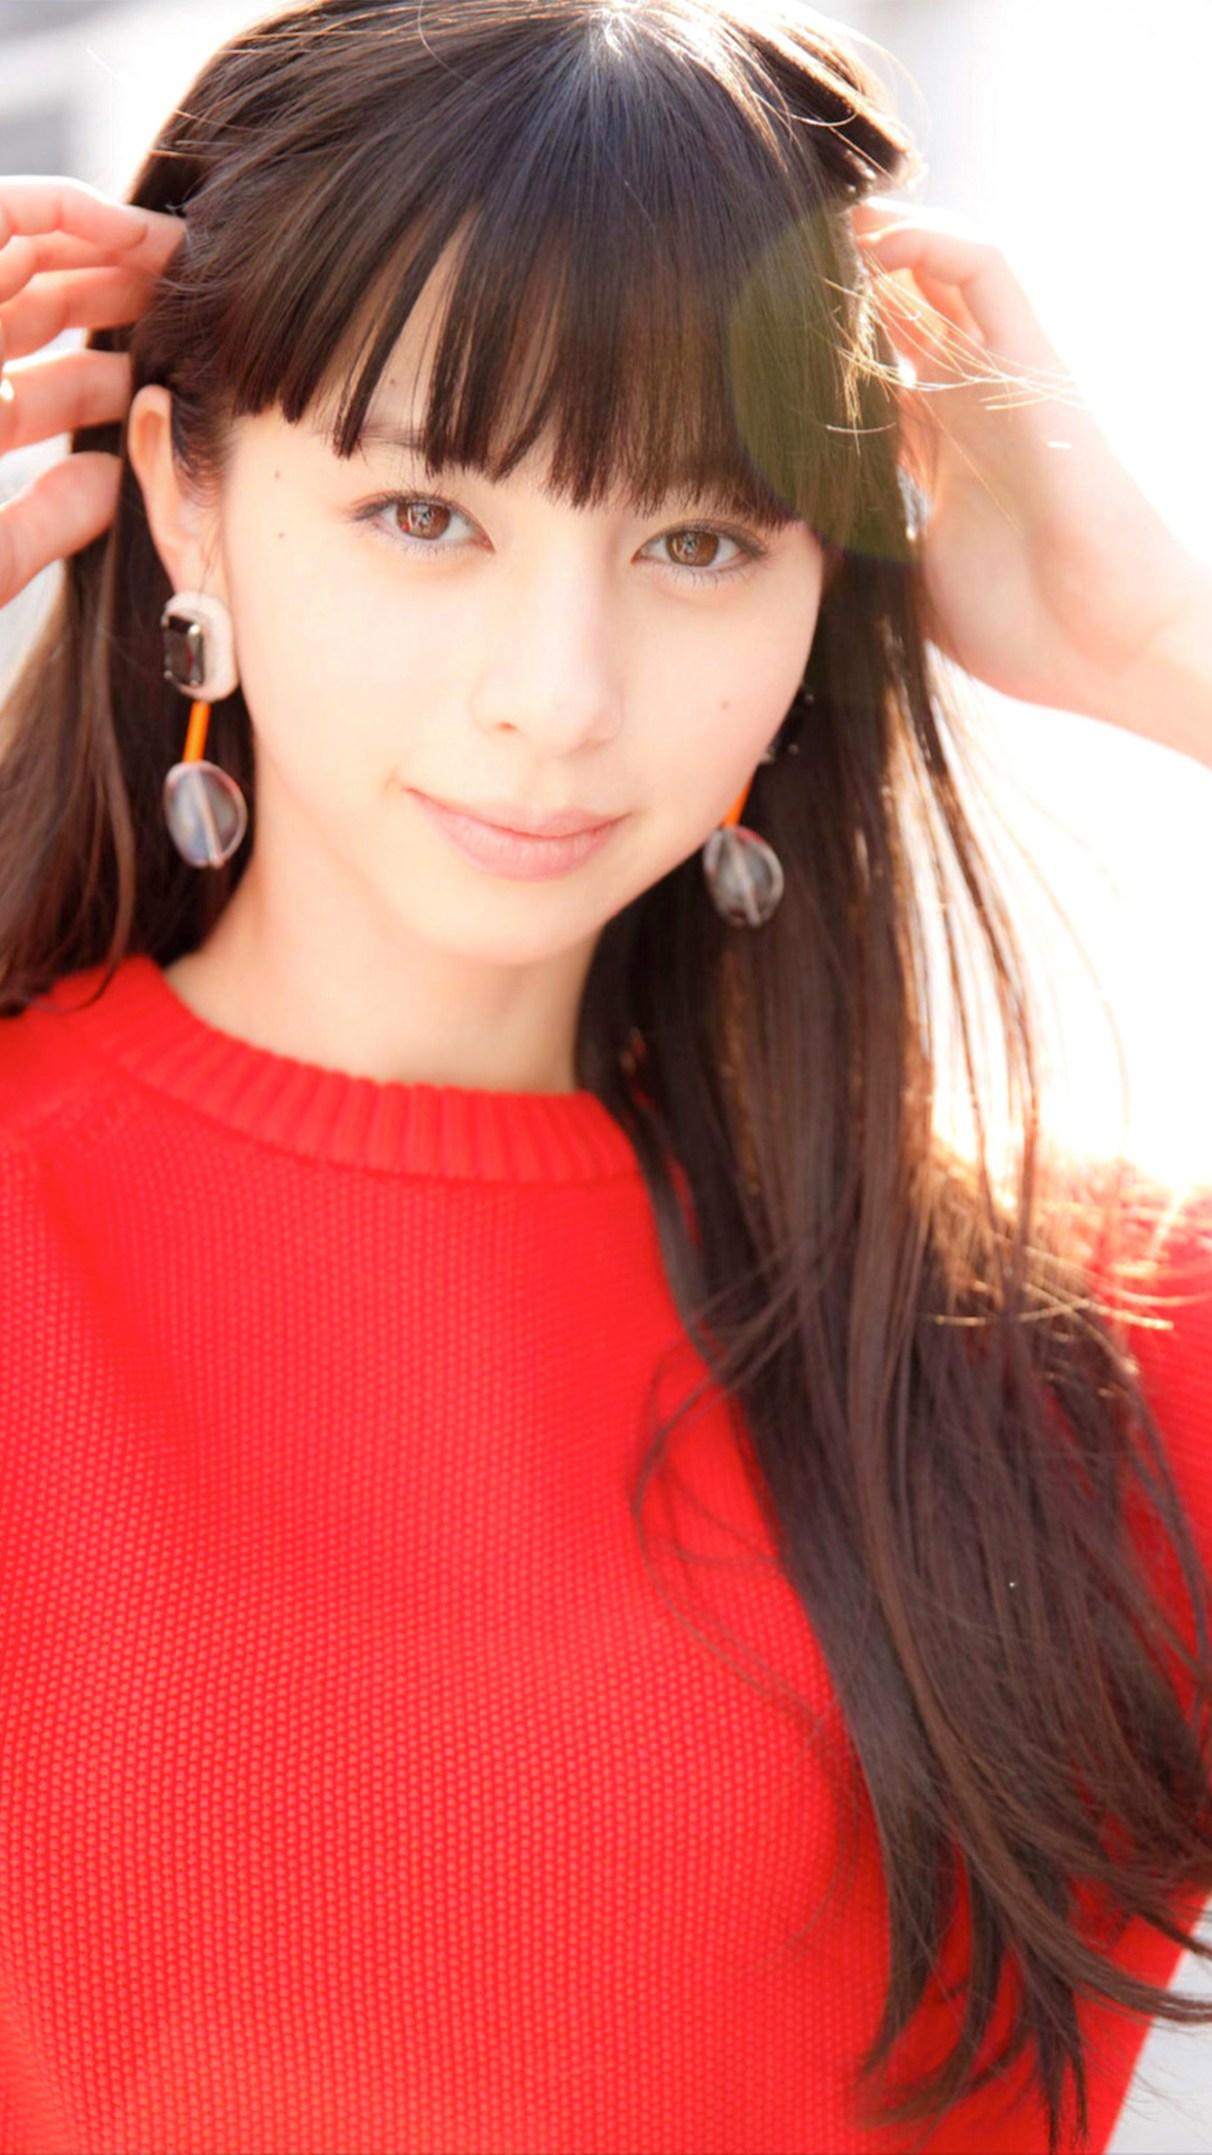 iphone_nakajoayami_5